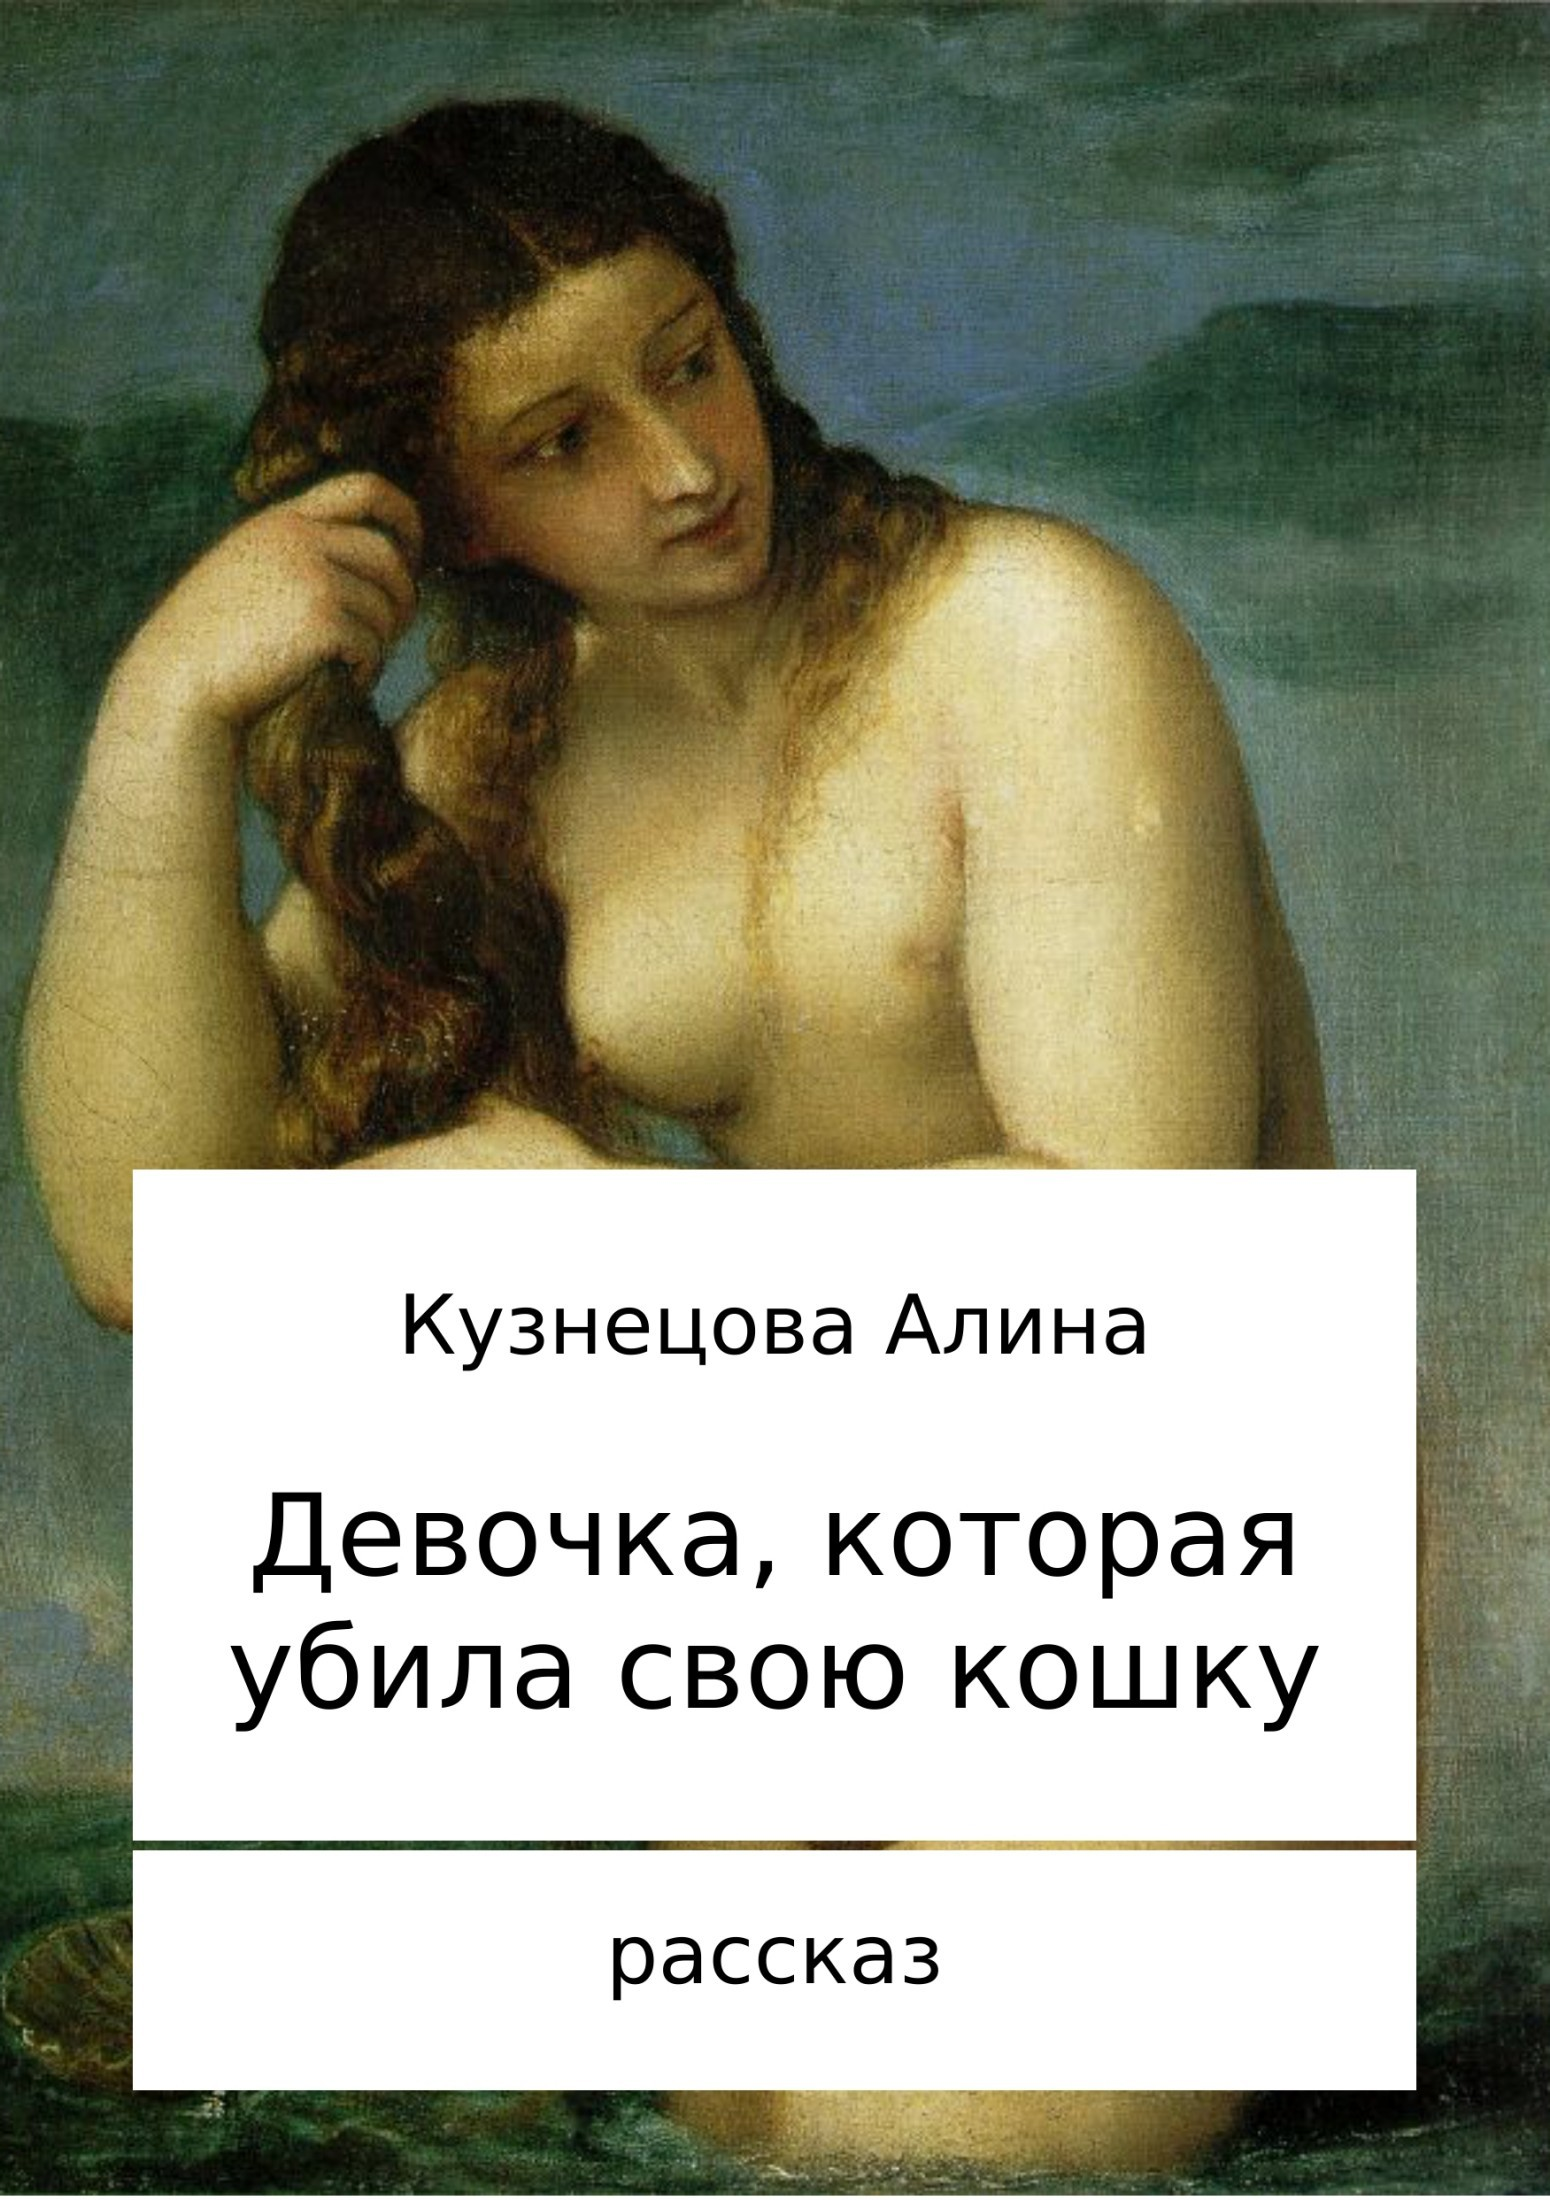 Алина Владимировна Кузнецова бесплатно